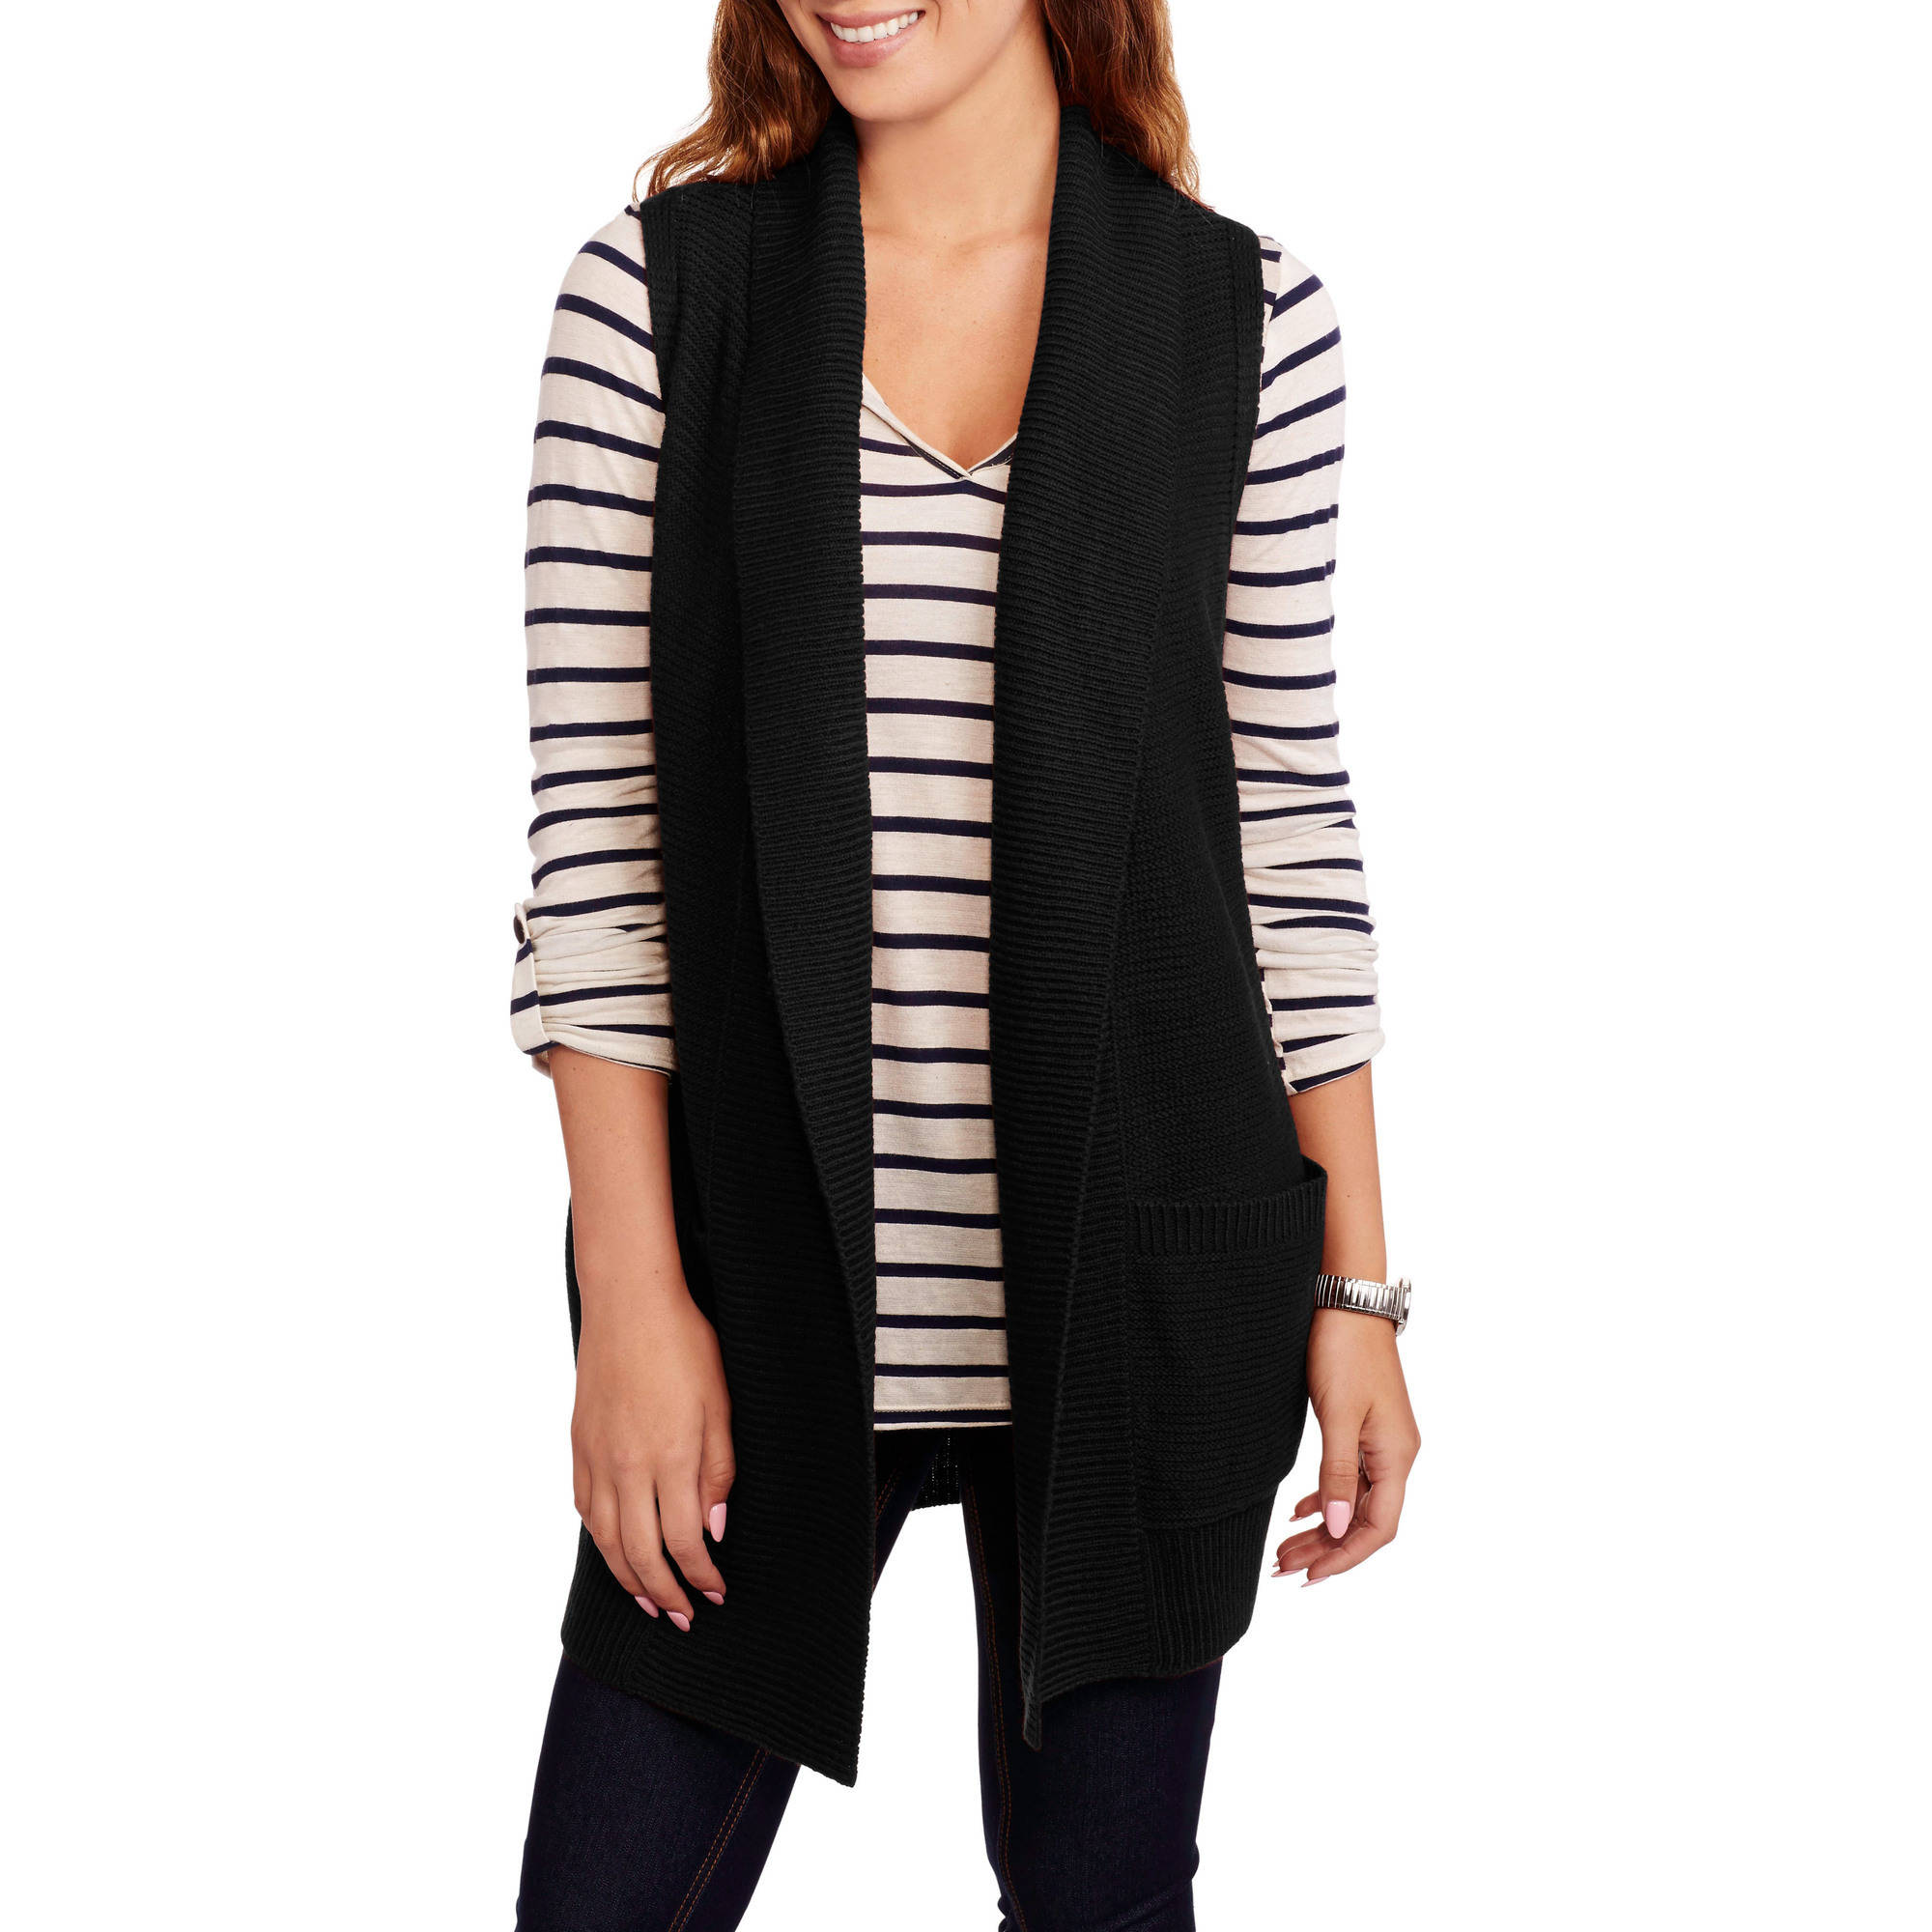 Faded Glory Women's Sleeveless Shawl Collar Sweater Vest - Walmart.com